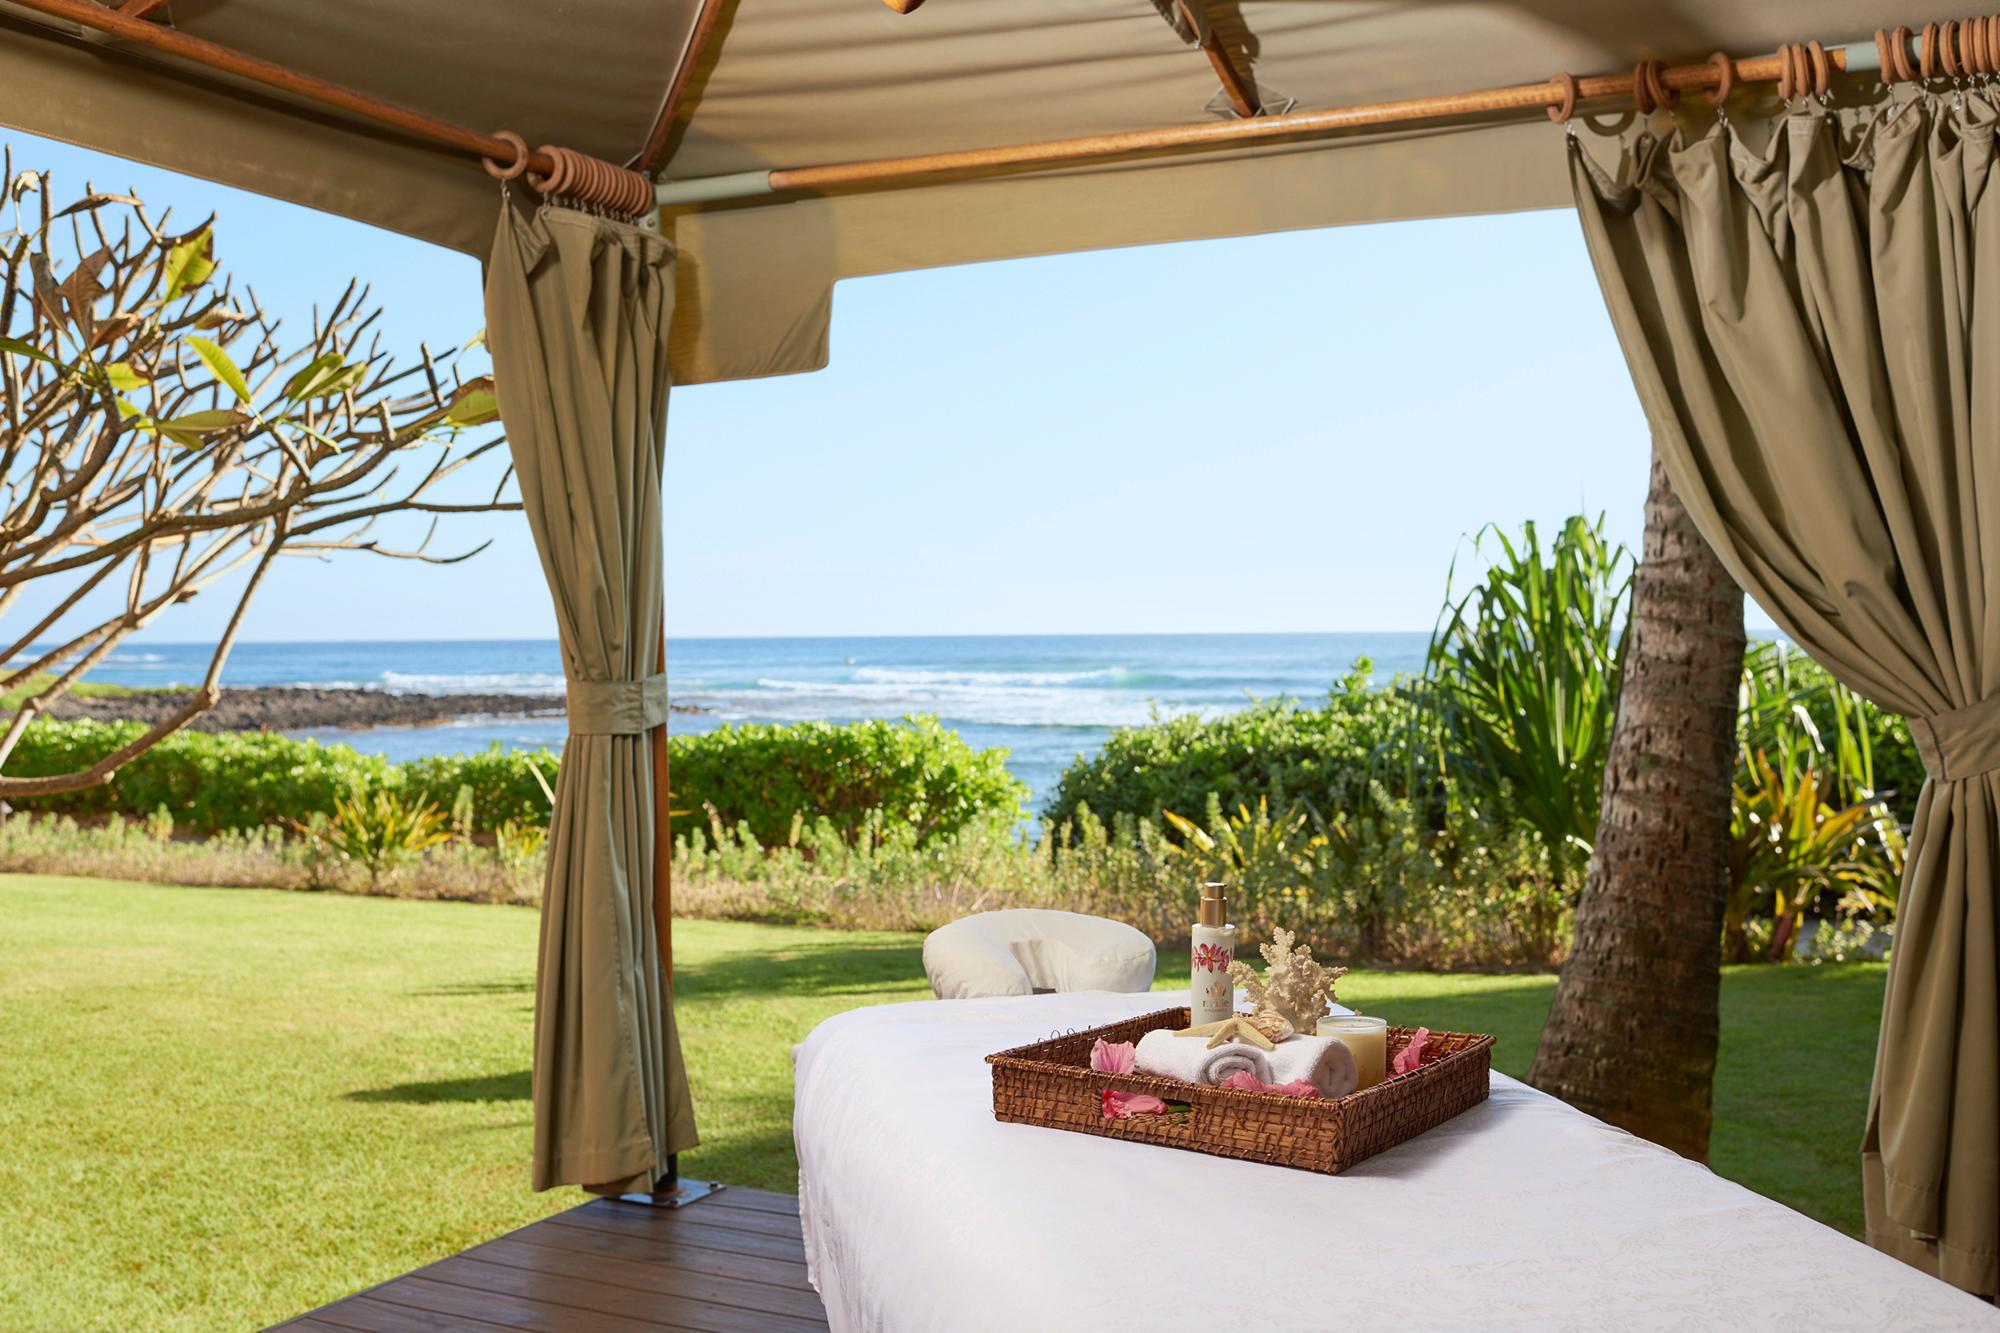 A Peaceful and Calming Hawaiian Sanctuary